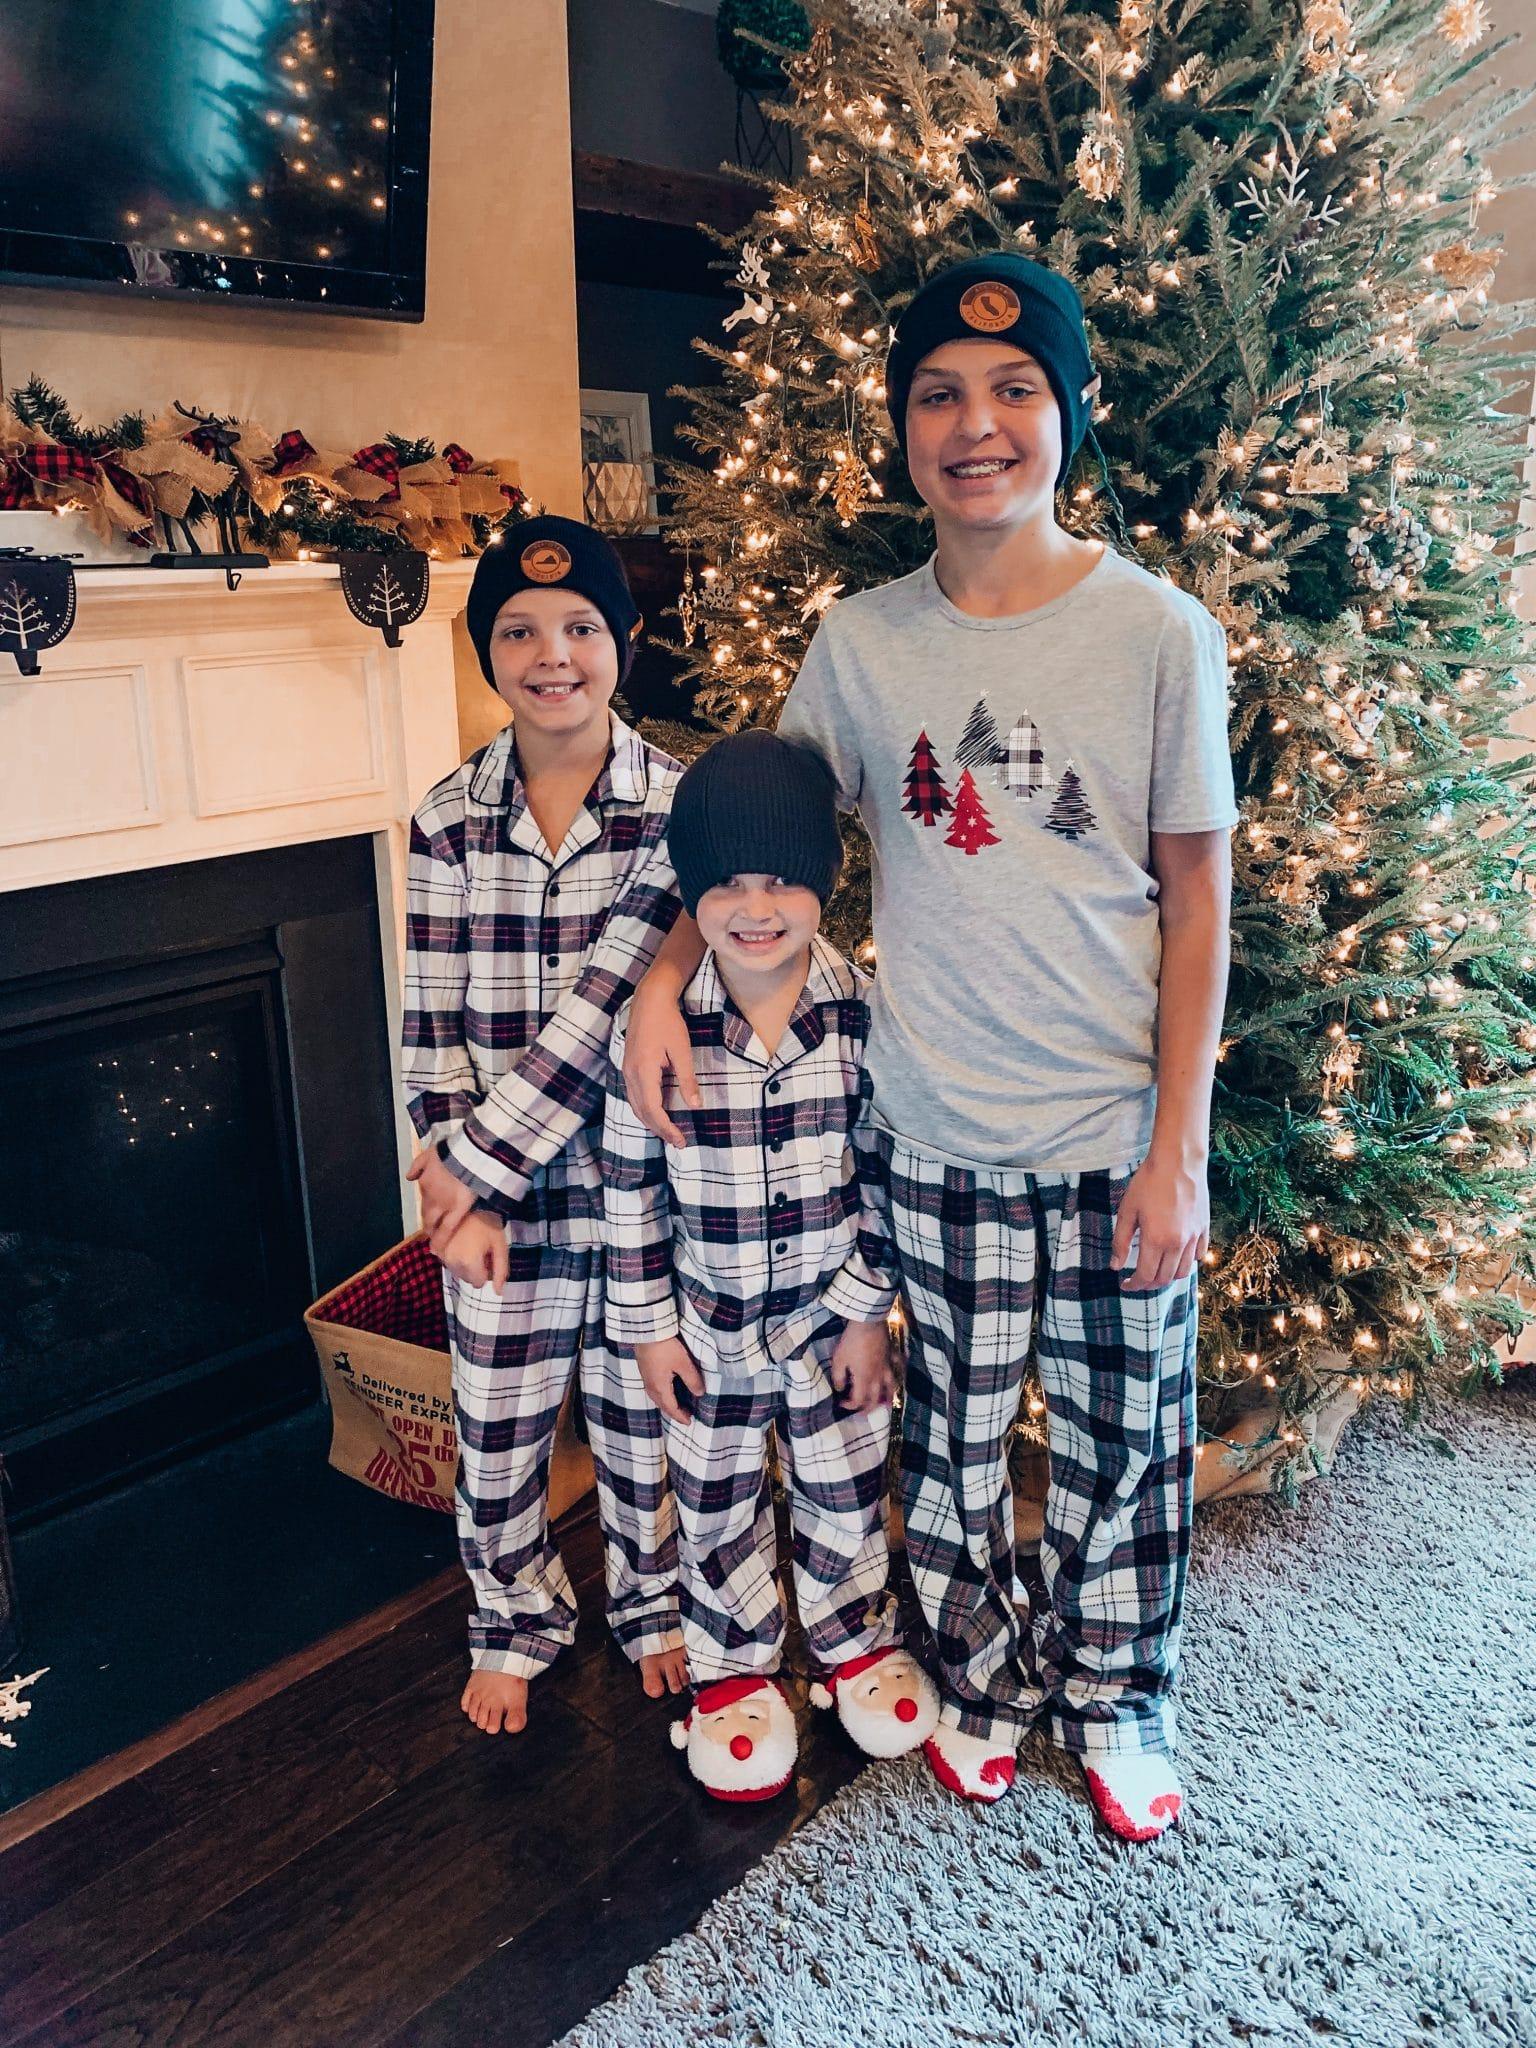 Family Matching pajamas, Stilettos and Diapers, Christmas 2020, Christmas Home Decor